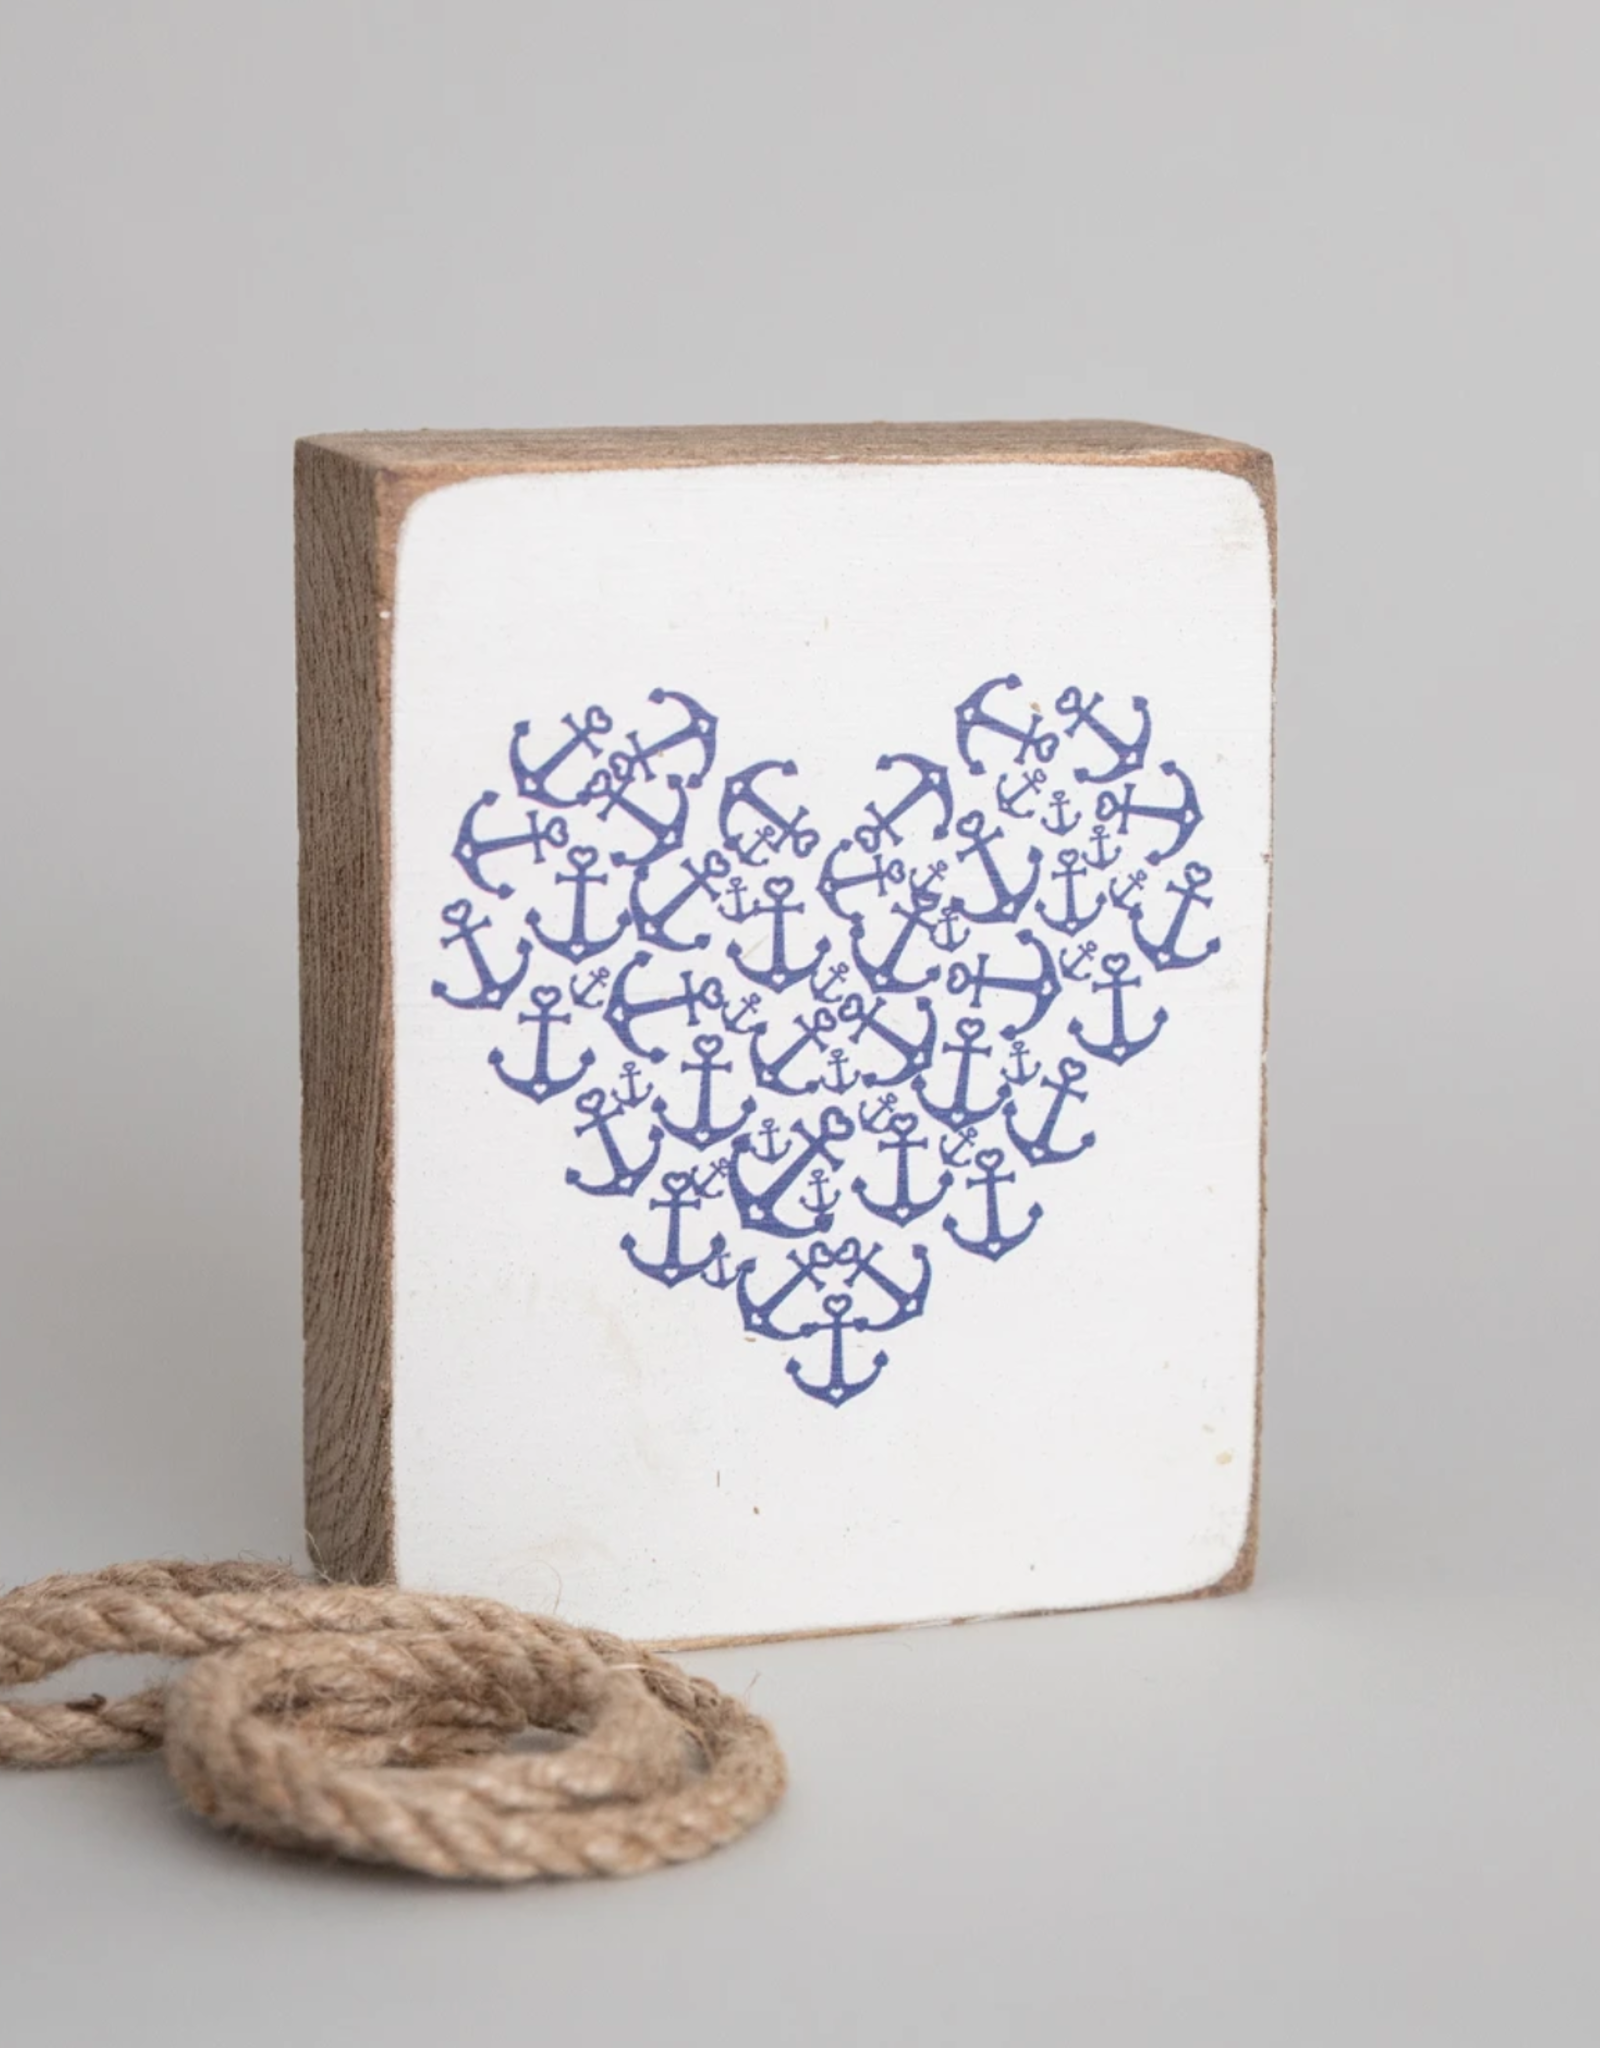 Rustic Marlin Rustic Marlin - Wood Block Anchor Heart